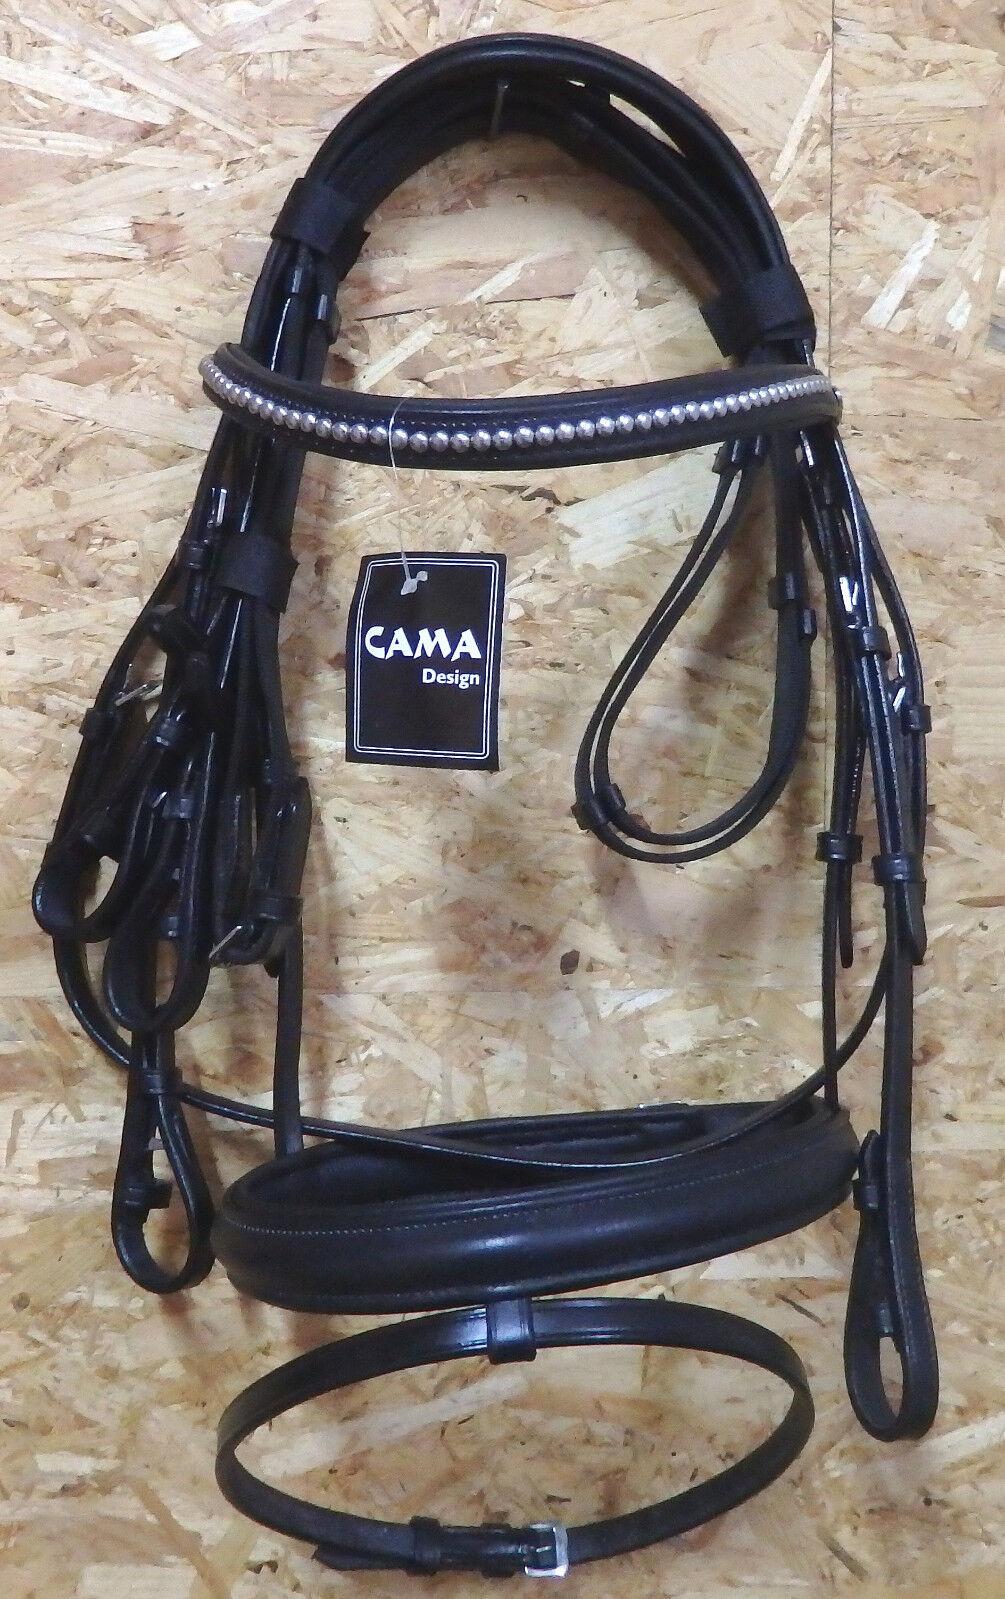 Cama Trense ,  Gr.Warmbluet, engl.RH,black, Antislipzügel. (3)  free delivery and returns